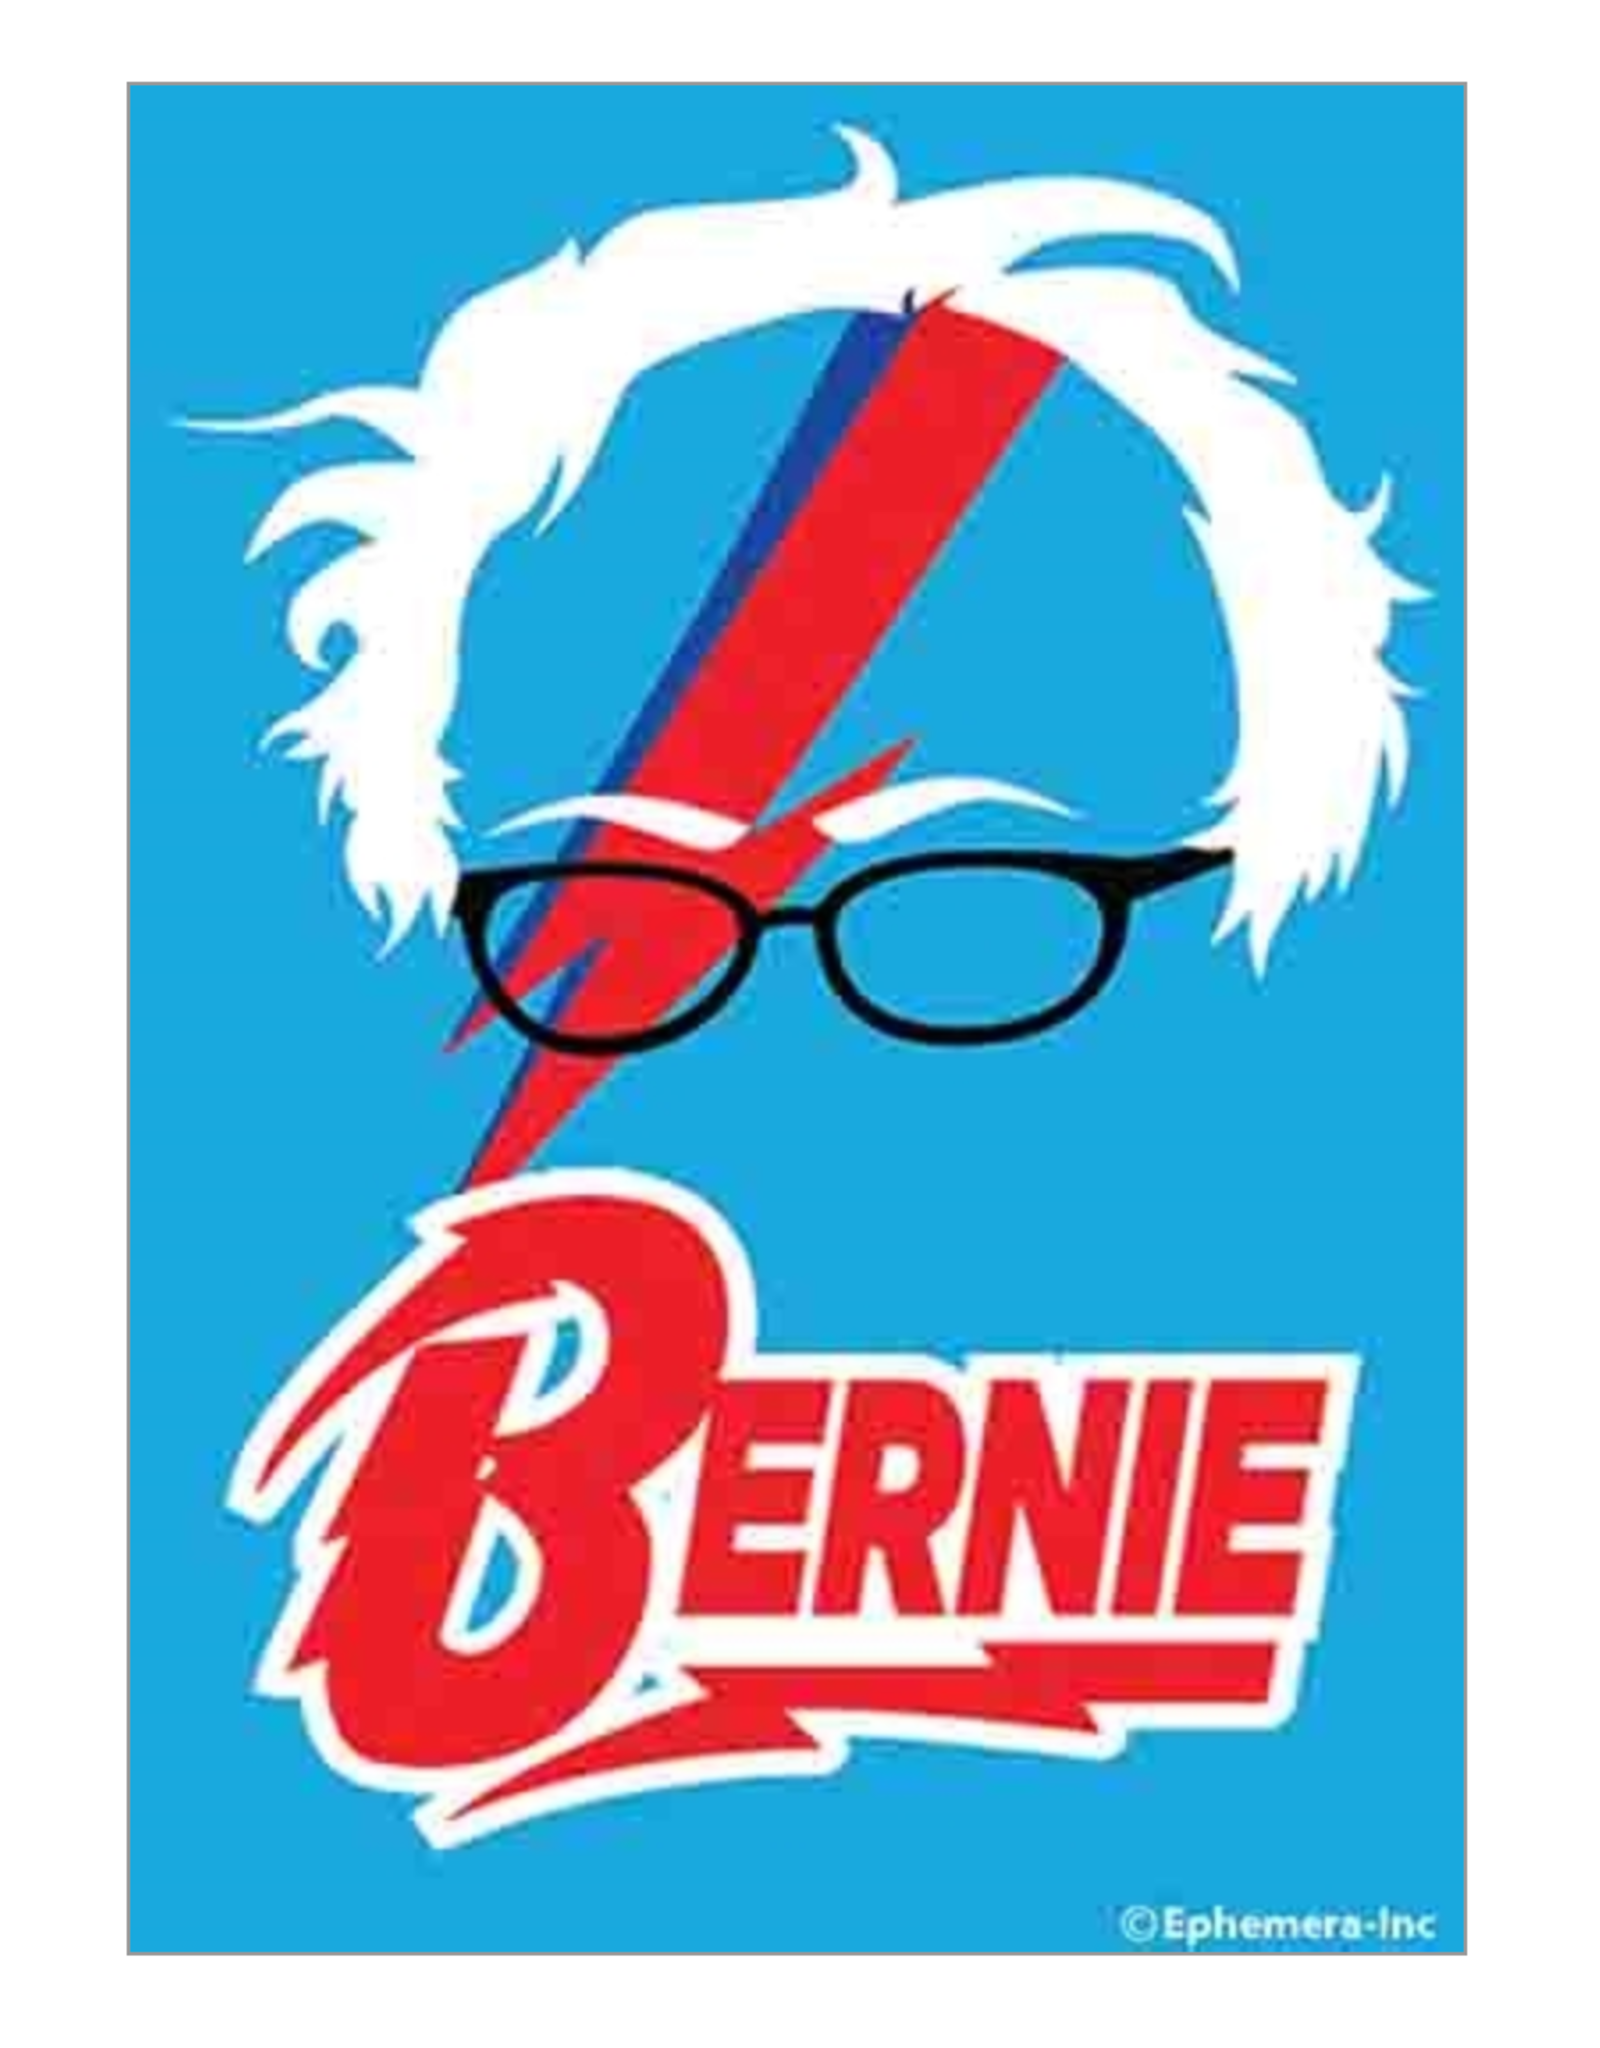 Bernie (David Bowie) Magnet